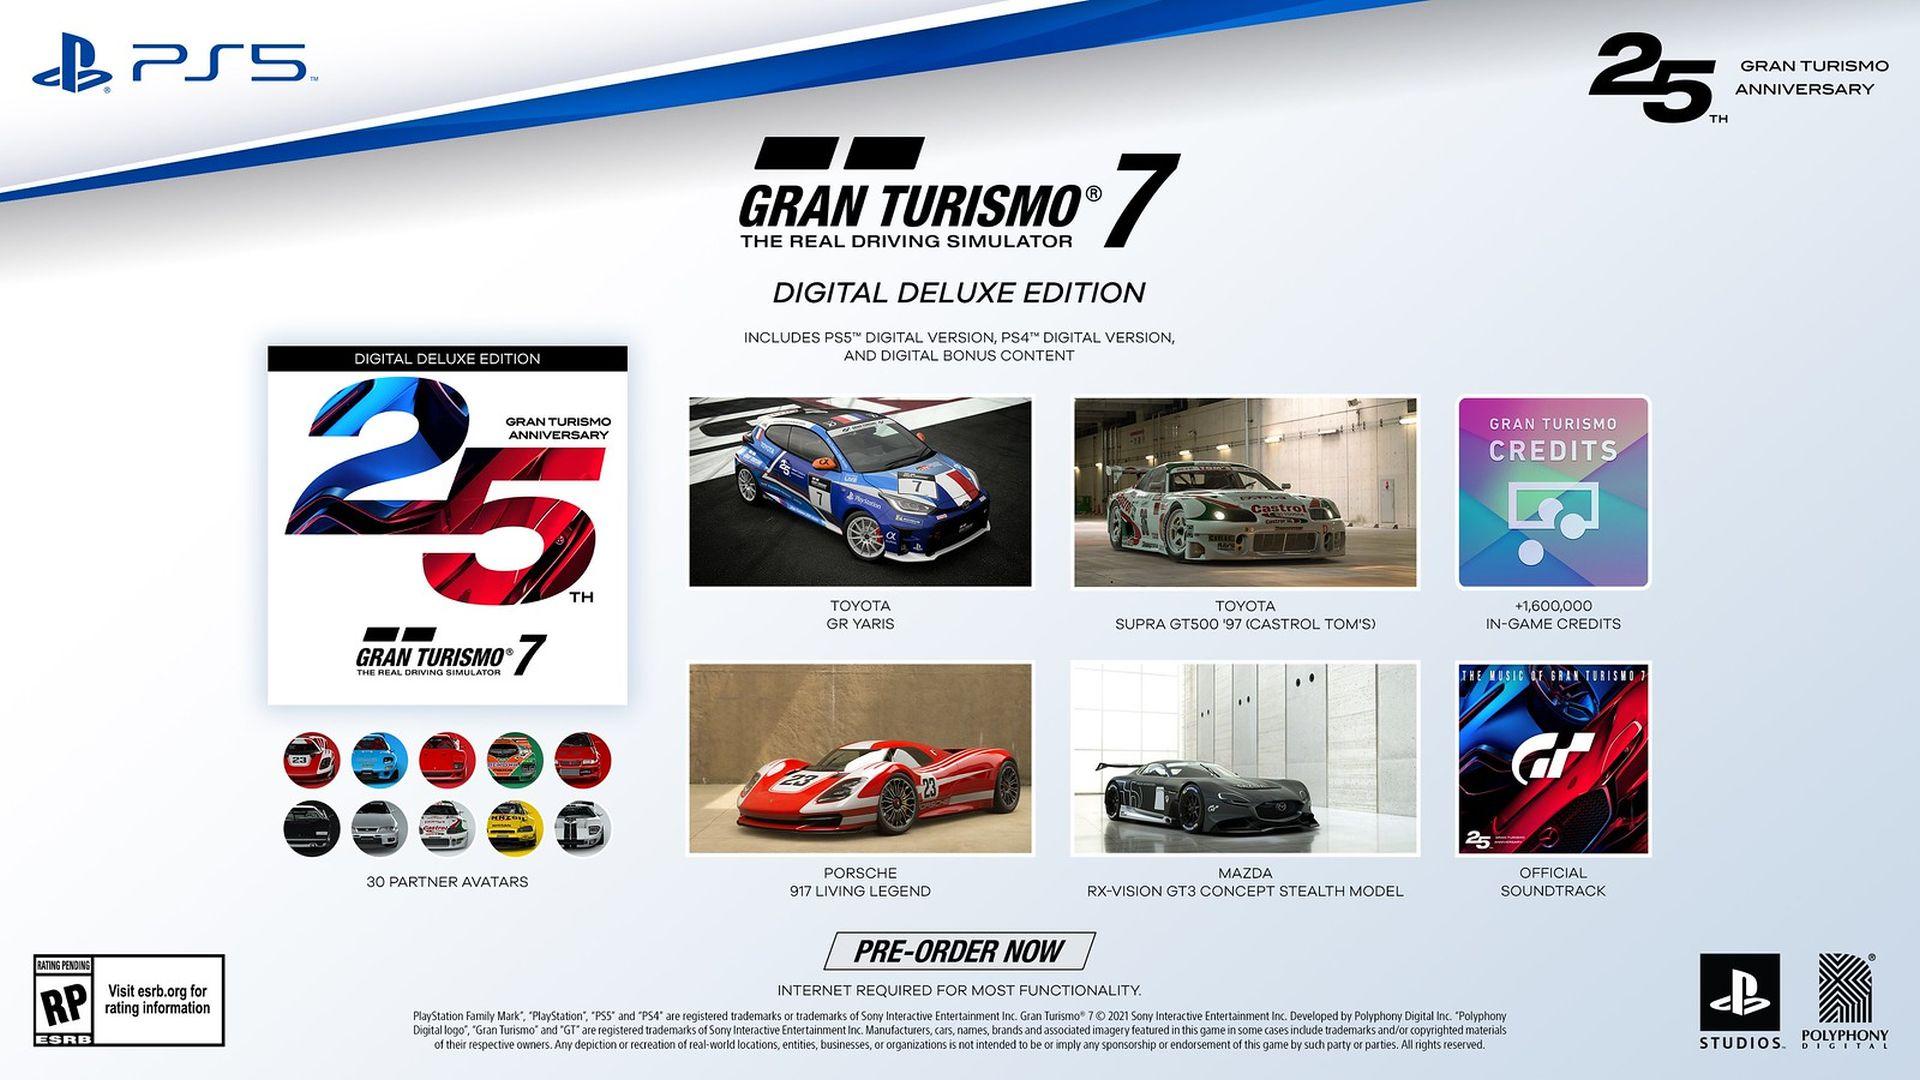 Gran Turismo 7 - Digital Deluxe Edition